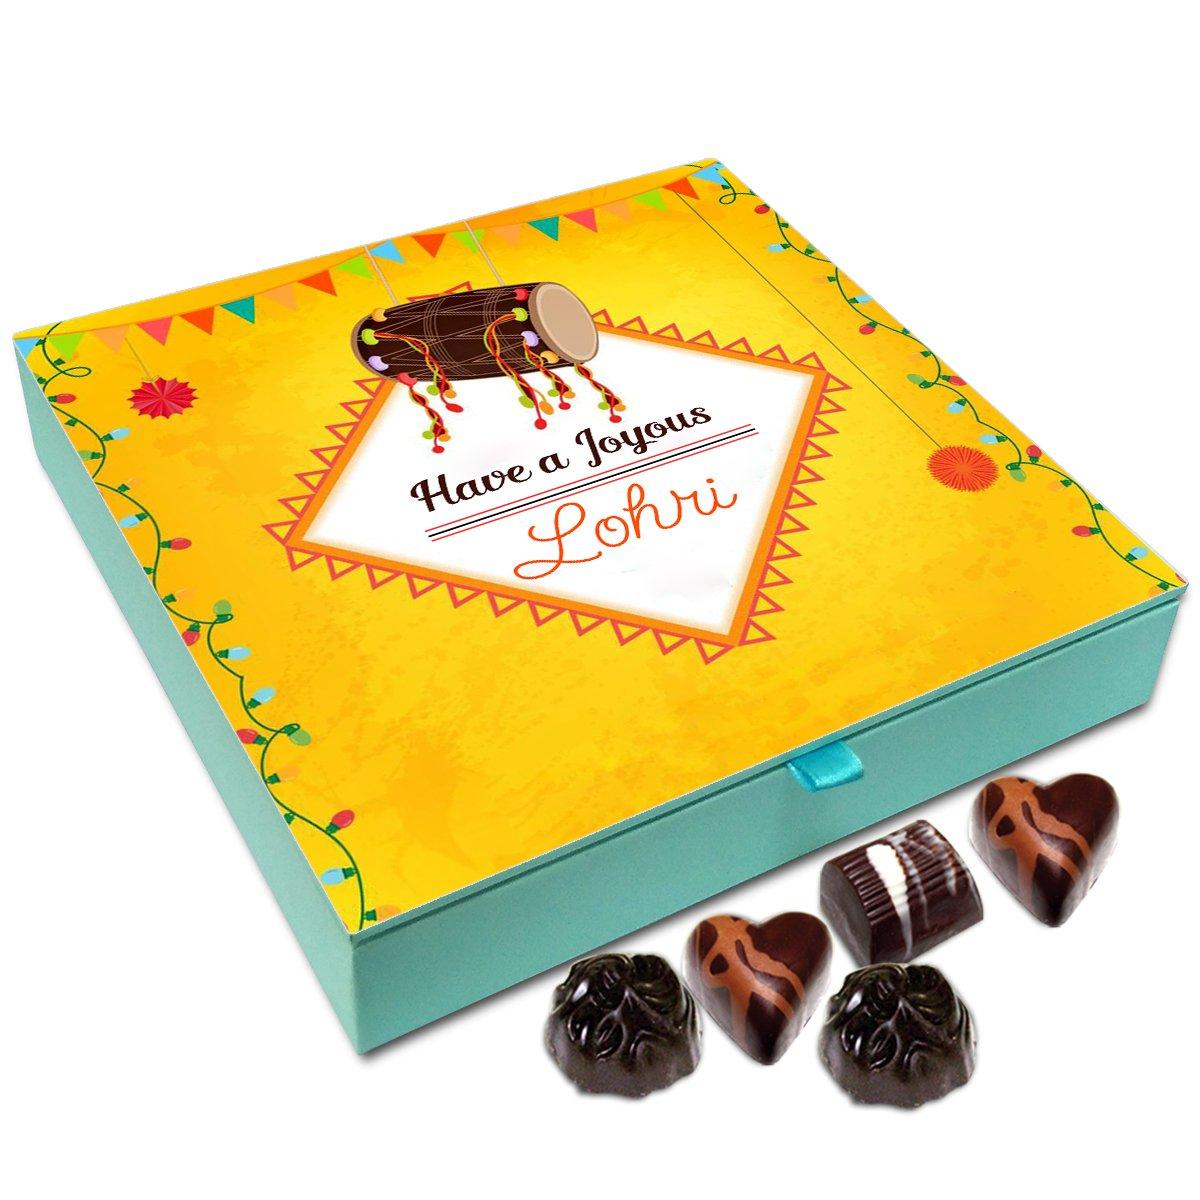 Chocholik Lohri Gift Box – Have A Joyous Lohri Chocolate Box – 9Pc